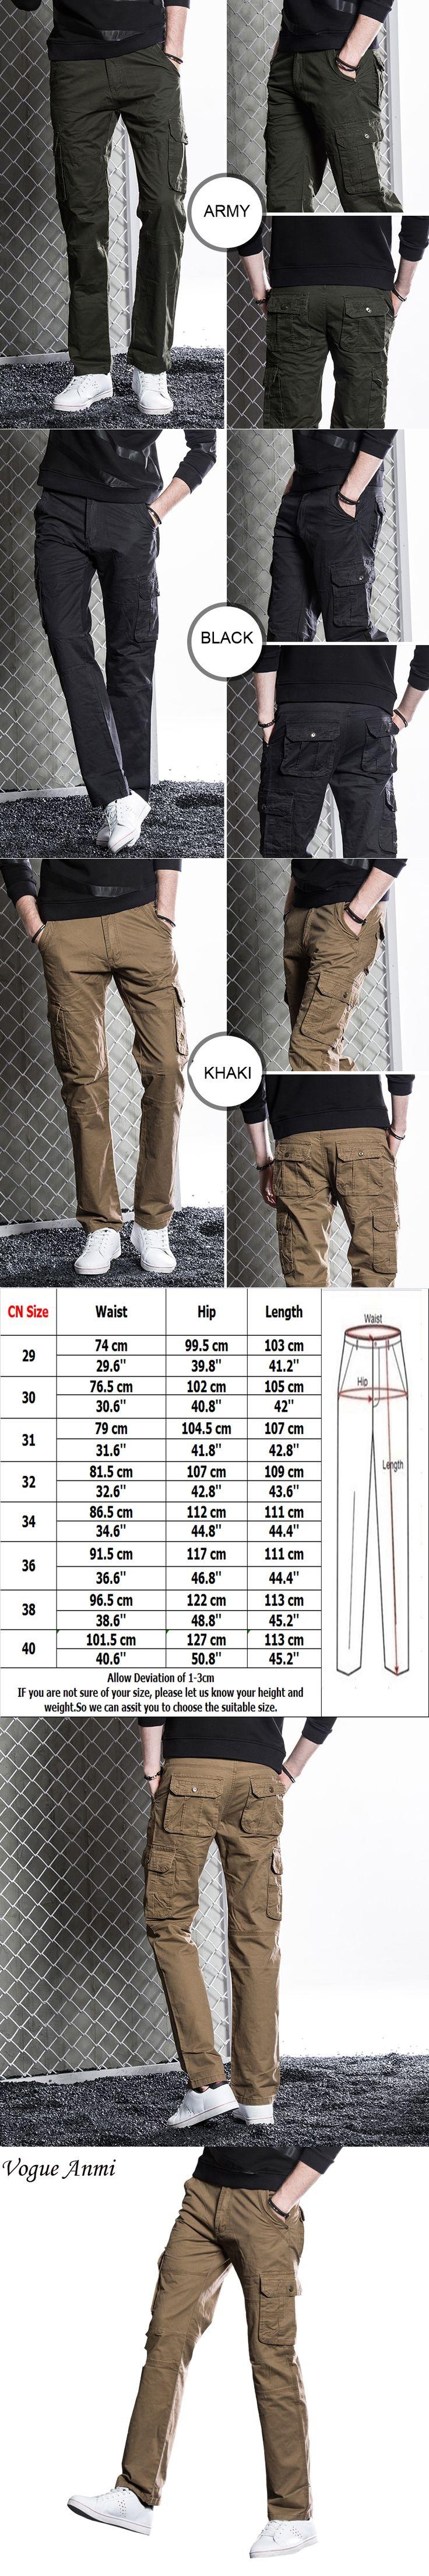 Vogue Anmi Men Cargo Pants Military Army Pant 100% Cotton Khaki/Army/Black Plus Size 30-40 mens Long trousers